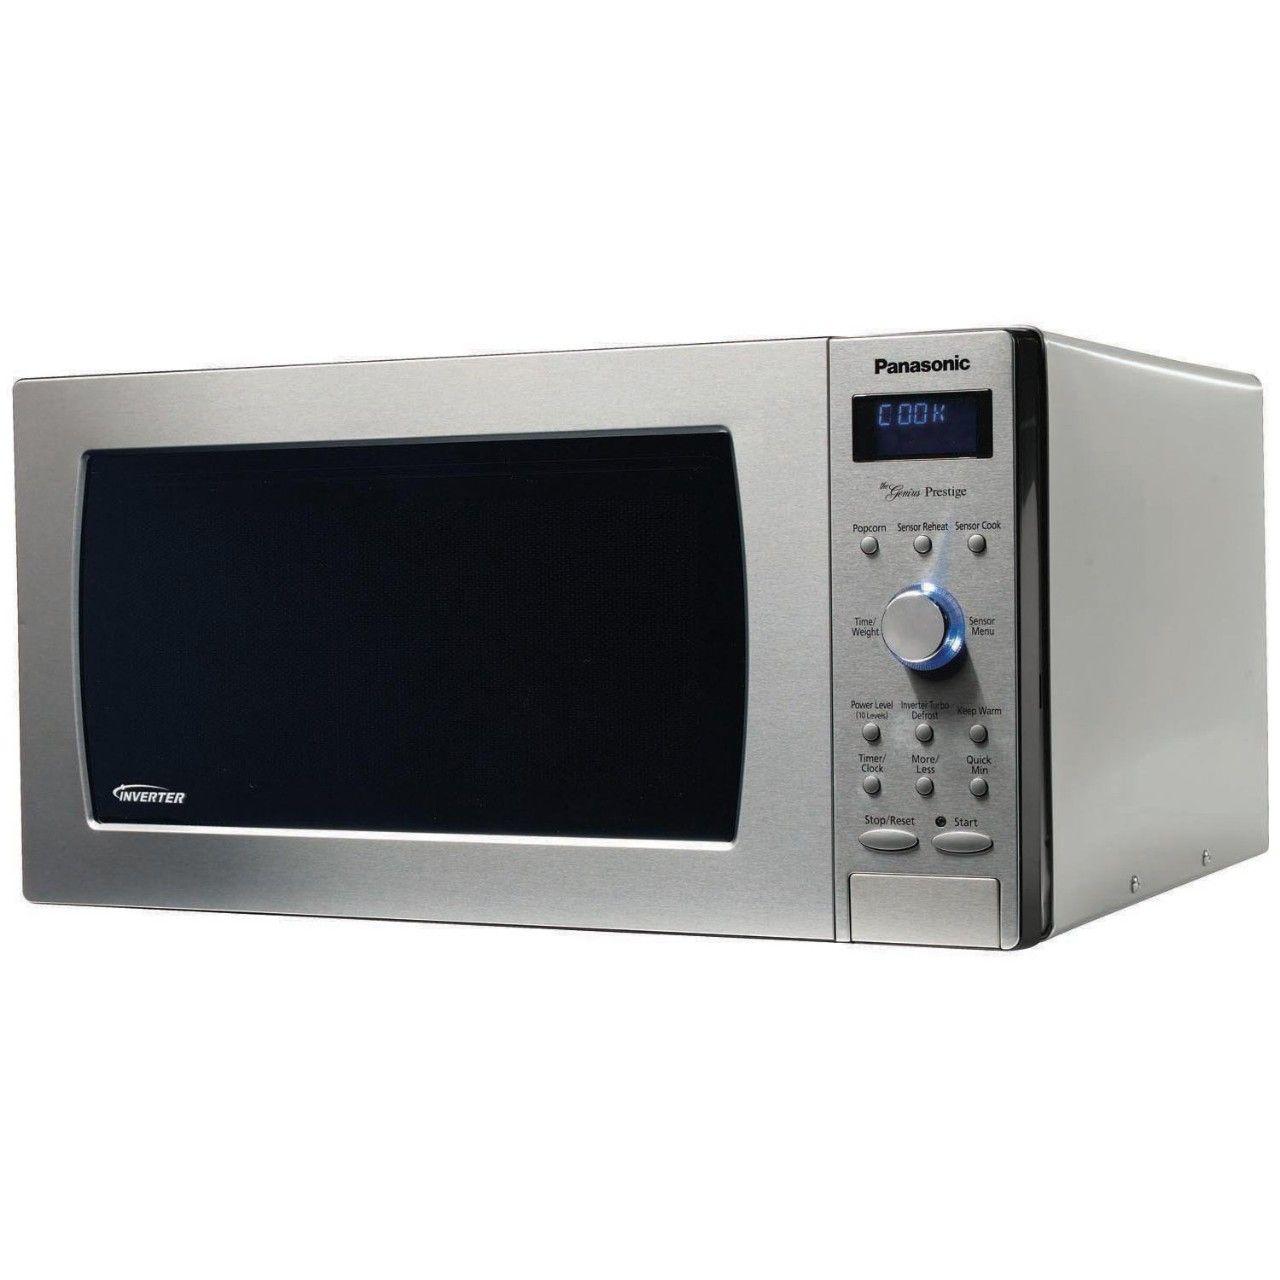 Panasonic Prestige NN-SD797S, 1.6cuft 1250 Watt Sensor Microwave Oven Panasonic 1250 Watt Microwave > http://computer-s.com/microwave-ovens/panasonic-1250-watt-microwave-inverter-technology-microwave-oven/